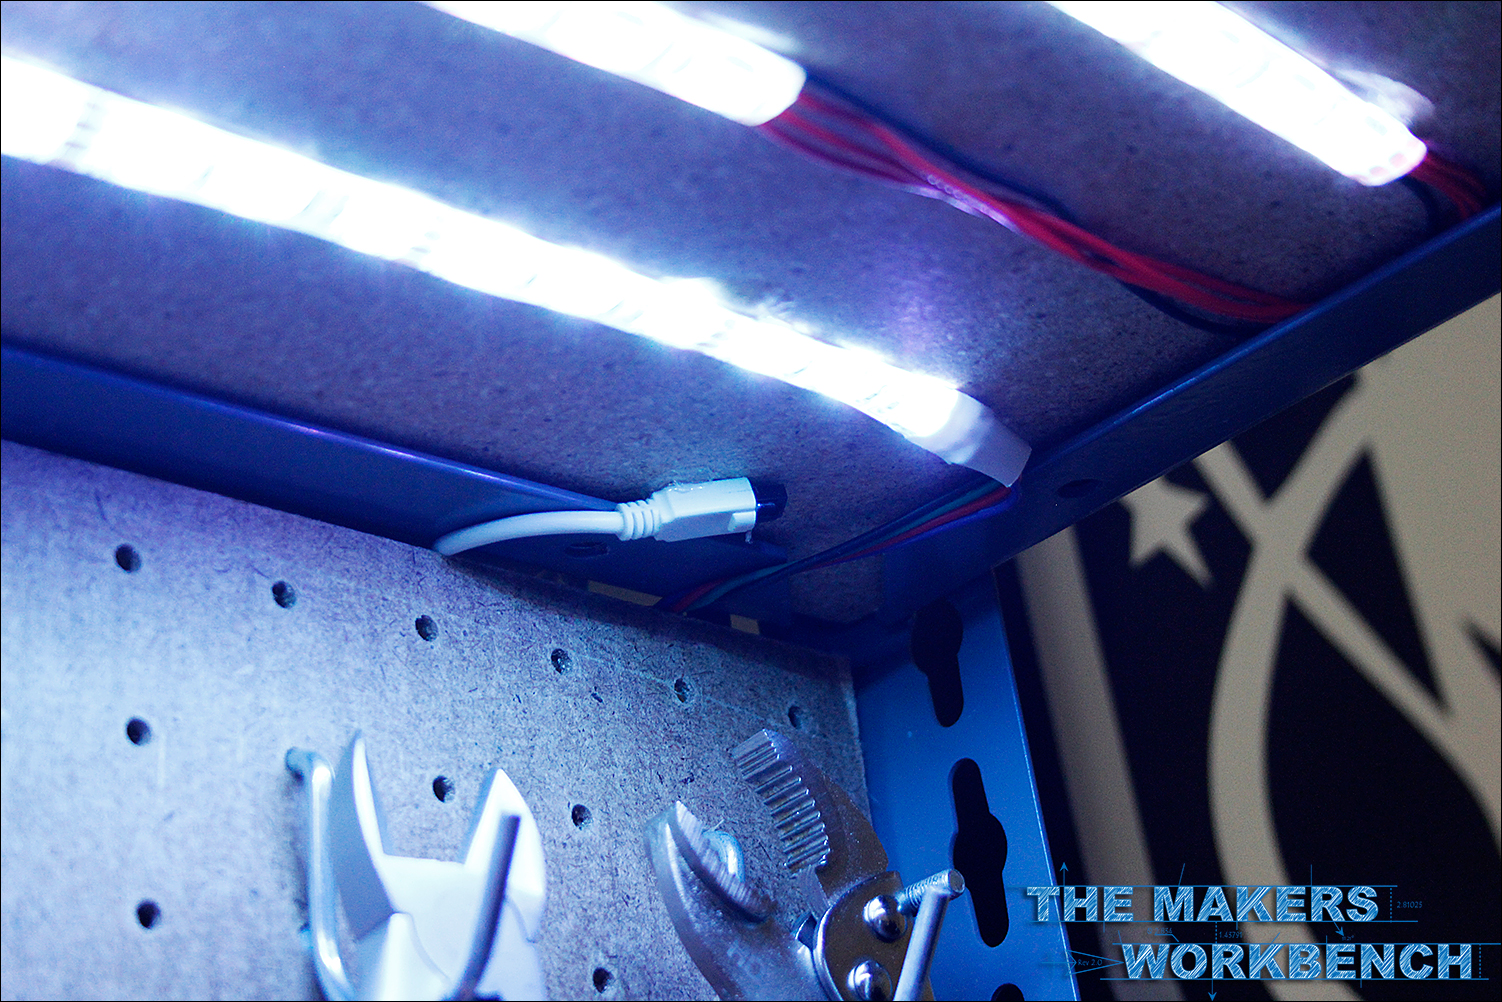 Rgb Led Under Shelf Bench Lighting The Makers Workbench